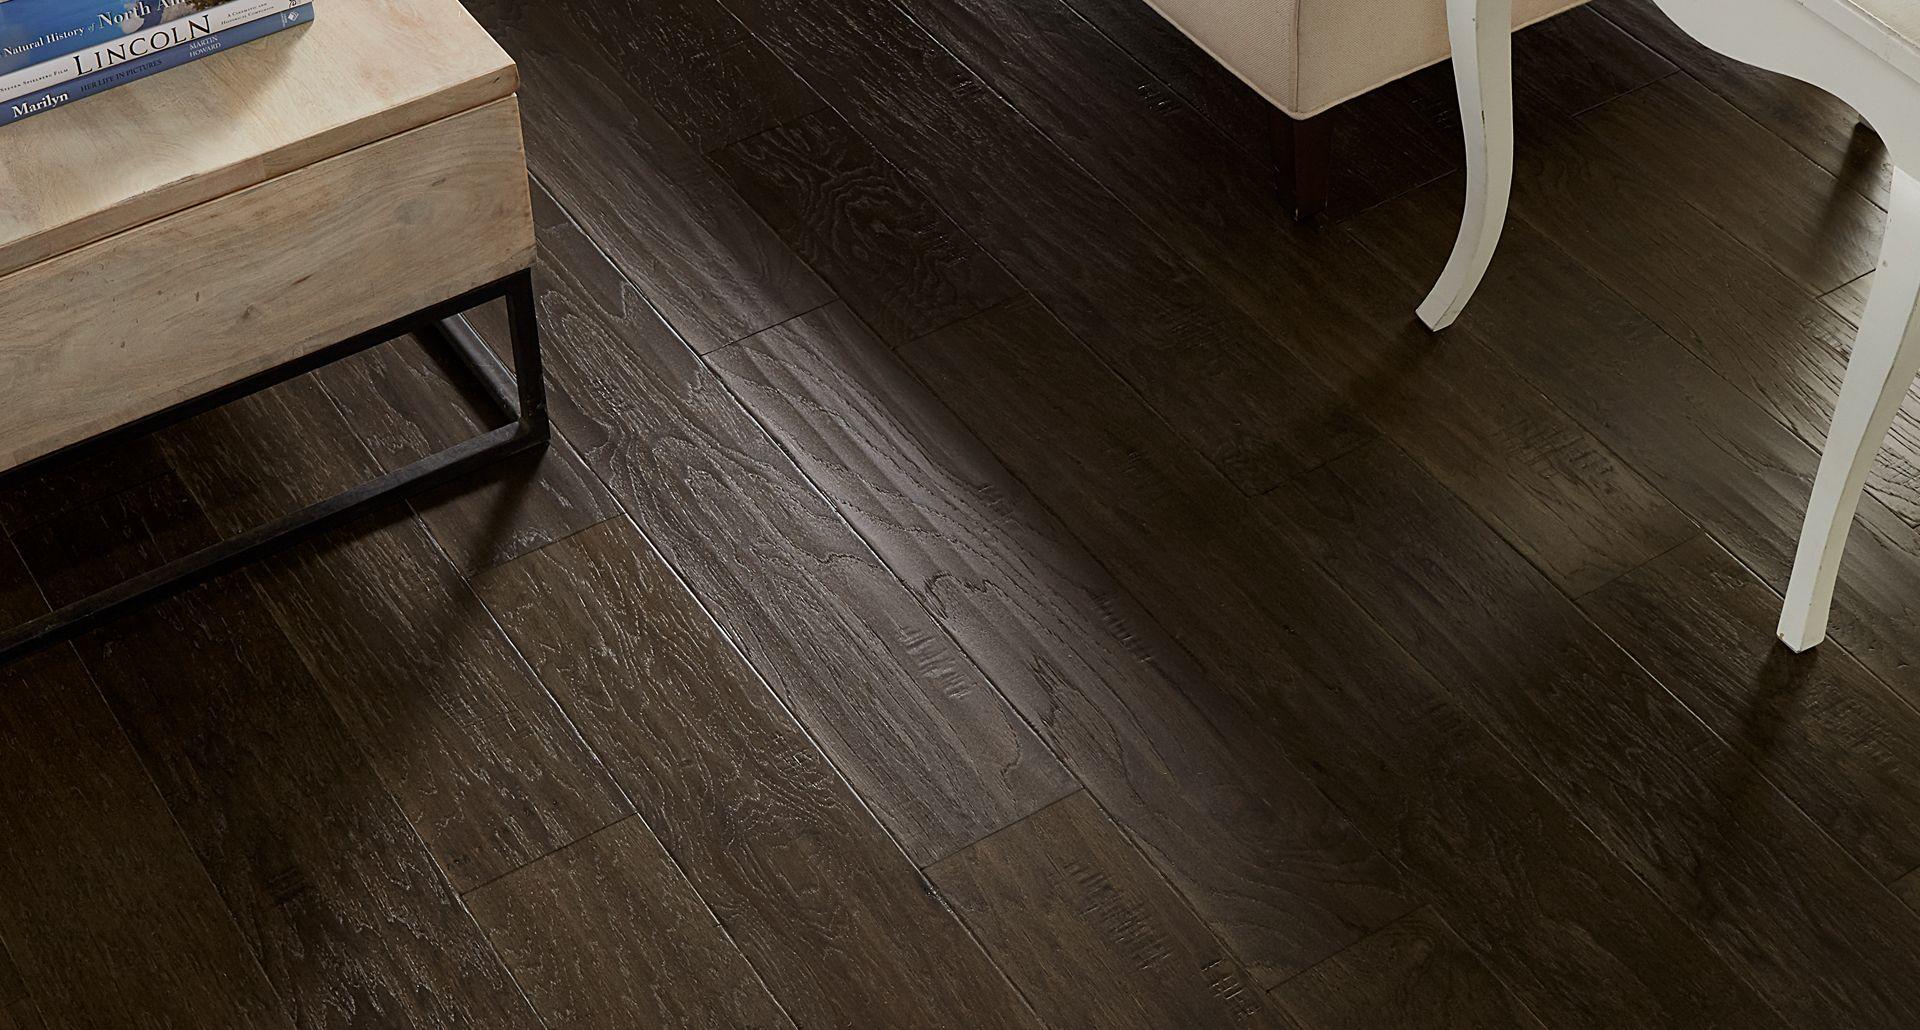 Grimsley Hickory Pergo Max Hardwood Flooring